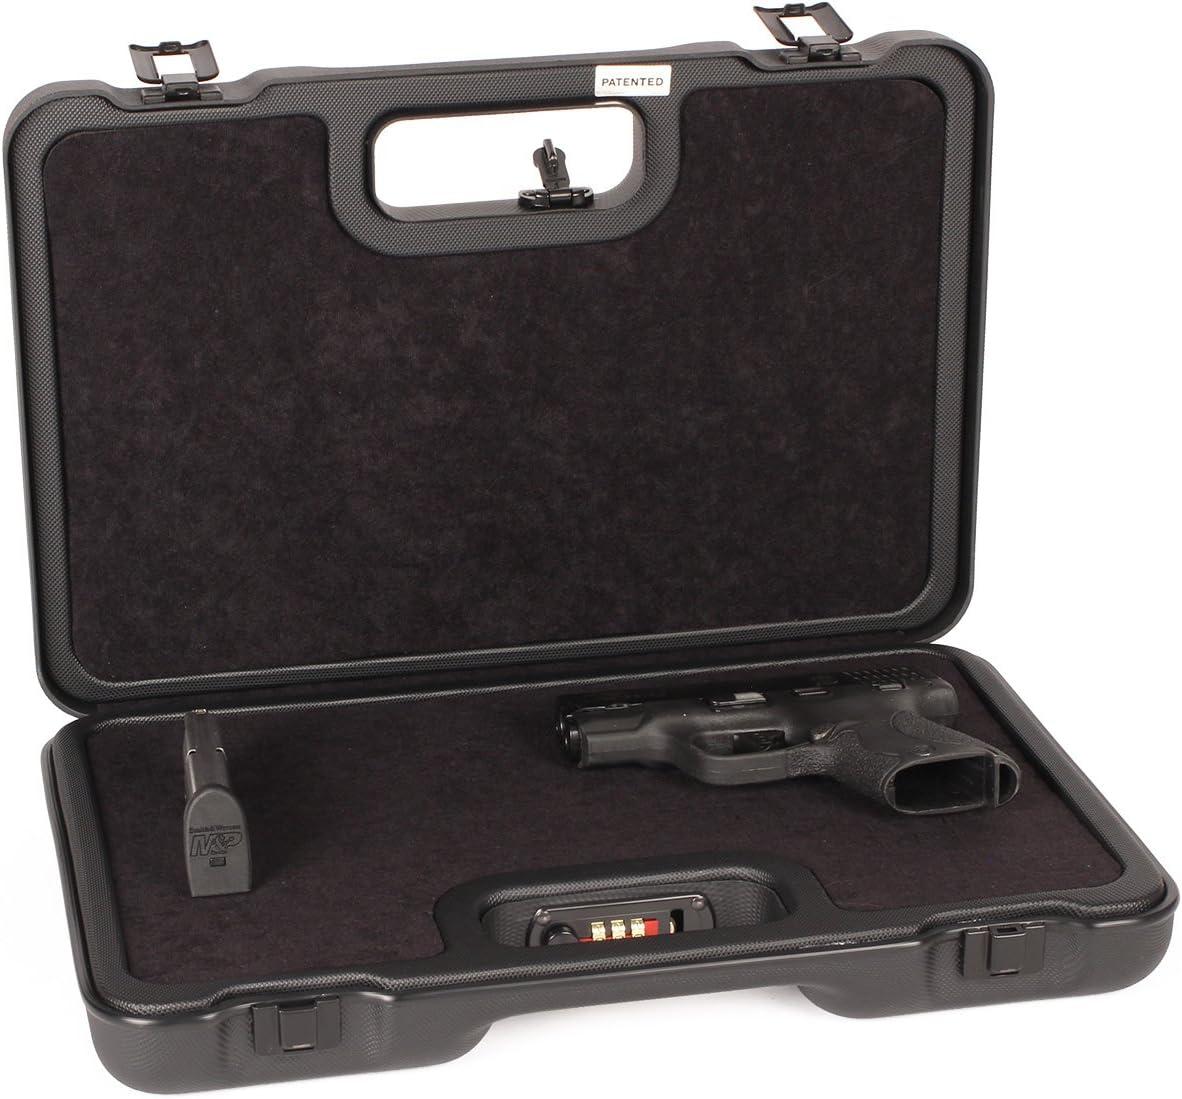 Indianapolis Mall Negrini Cases 2023UTS Cheap SALE Start 4839 Handgun 1 Case Black Gun